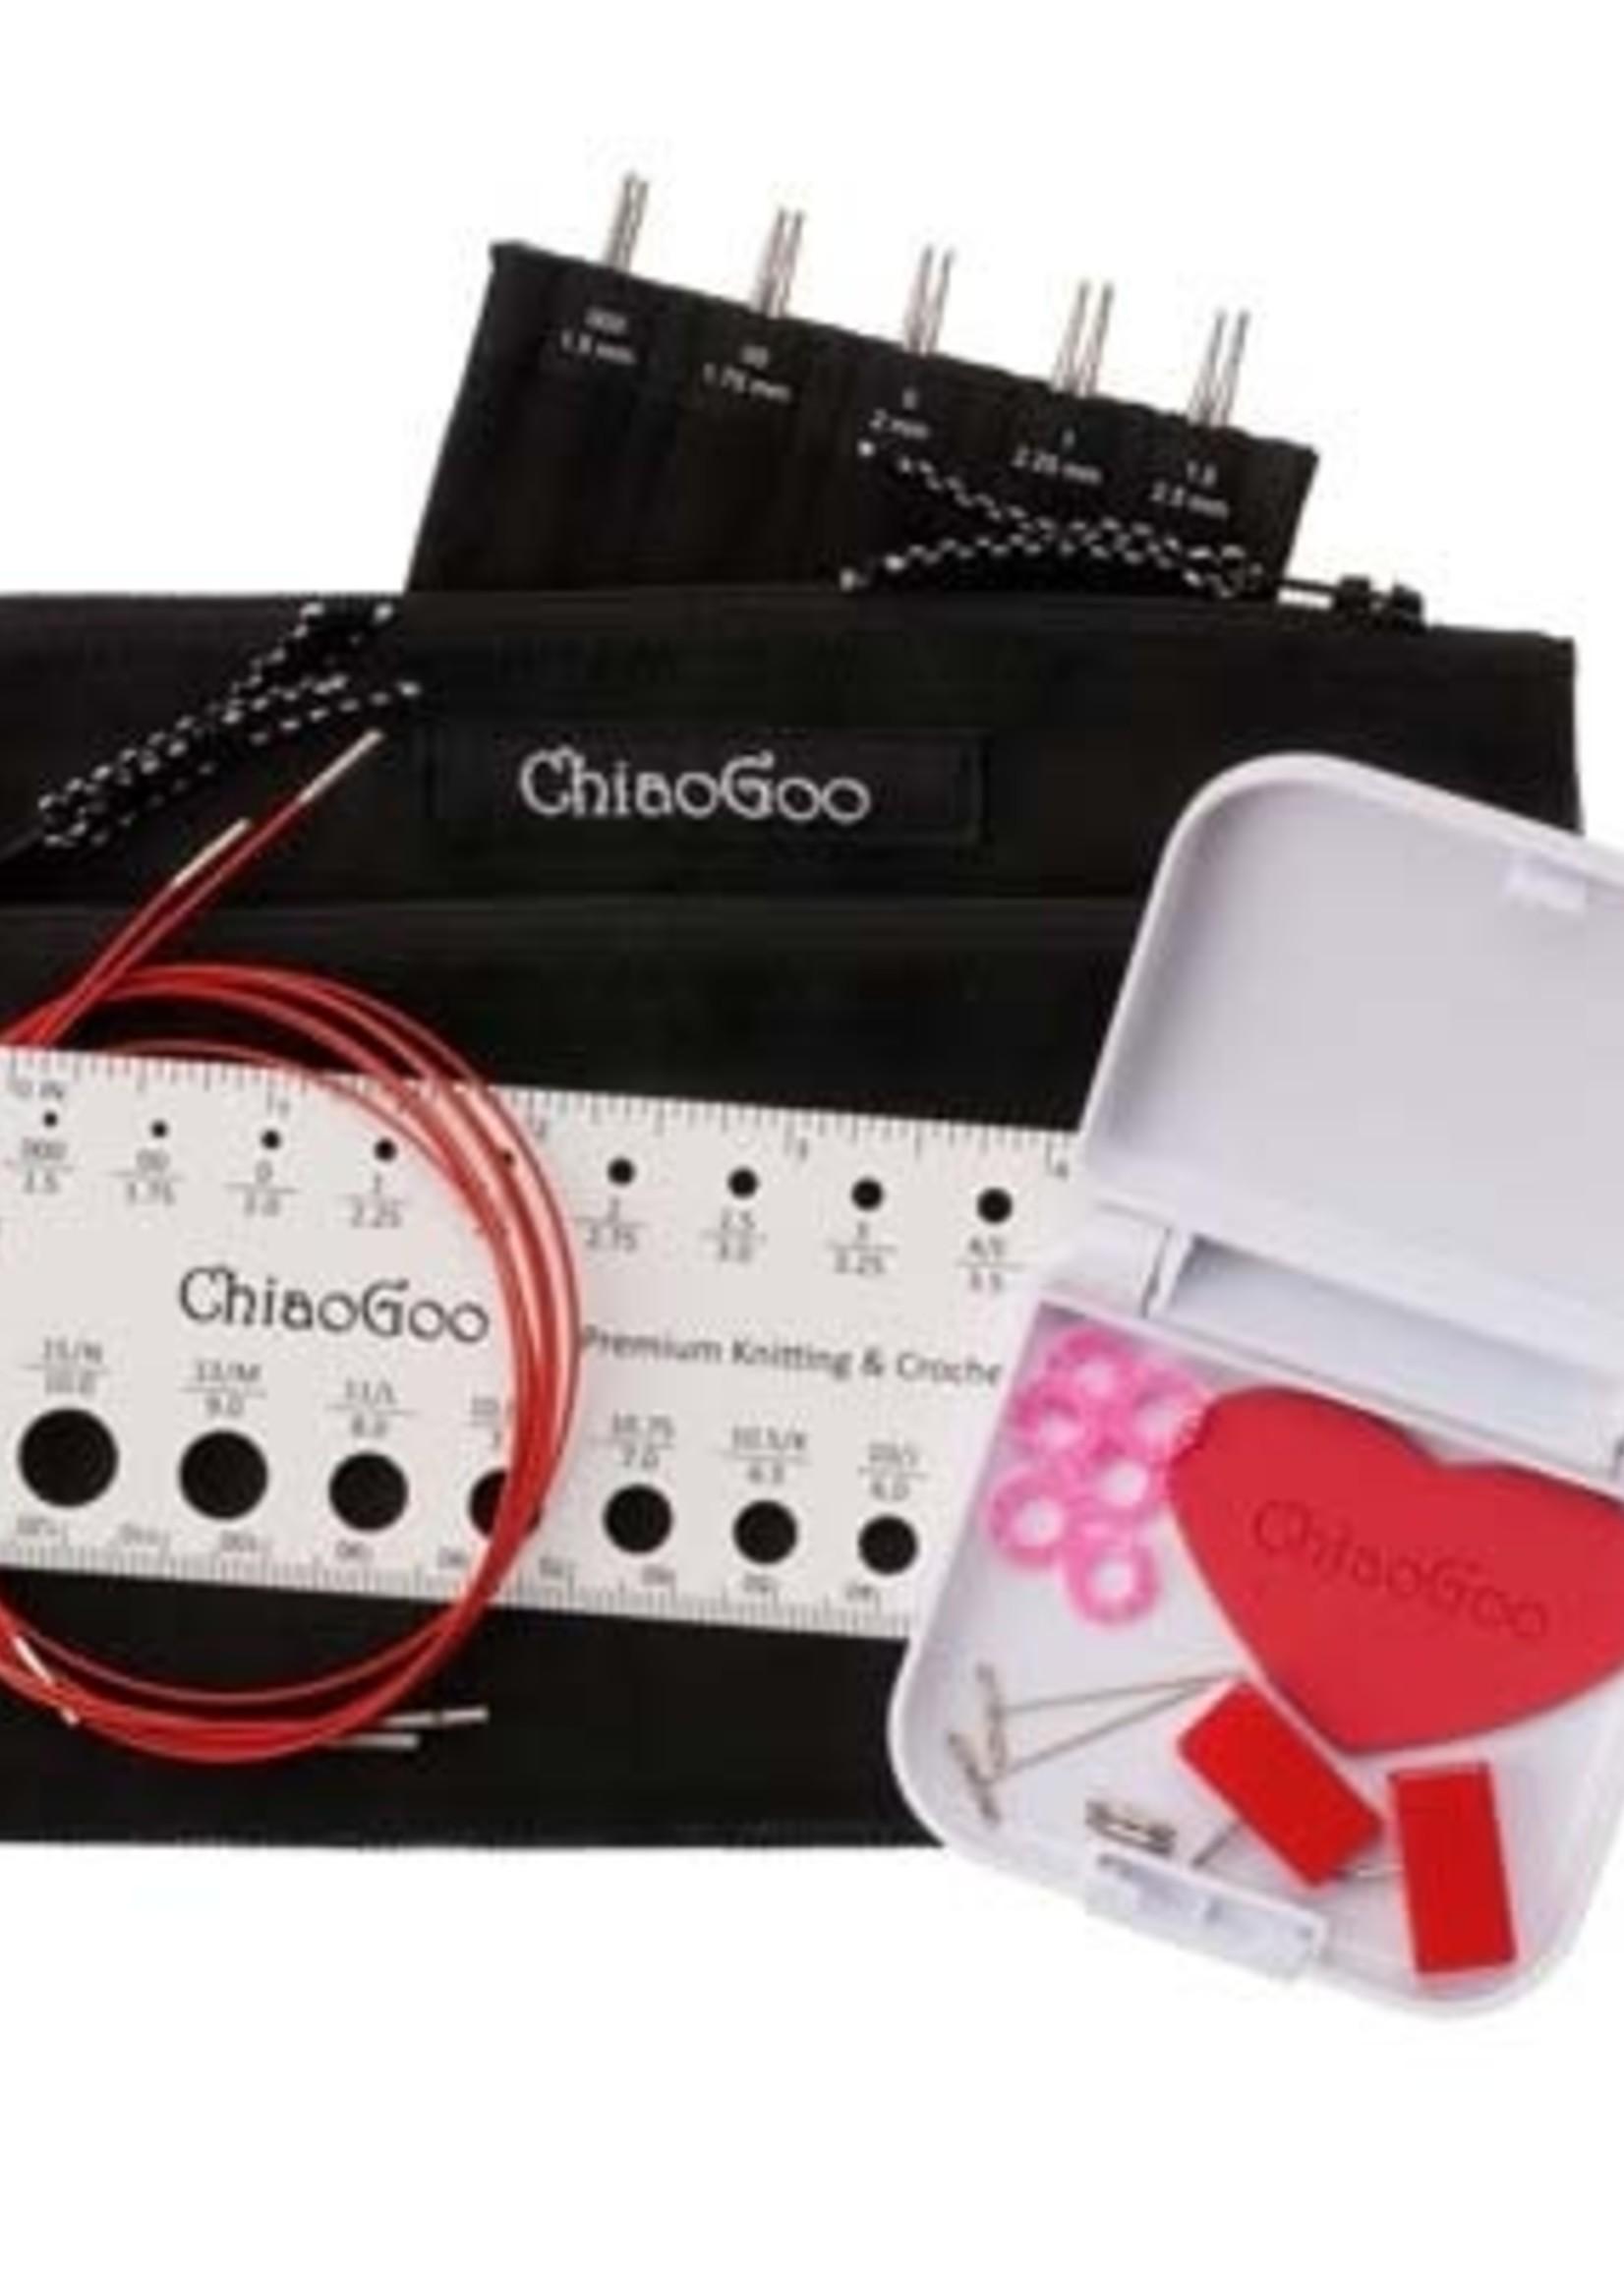 ChiaoGoo ChiaoGoo Twist Mini Interchangeable Set, 5'' tips